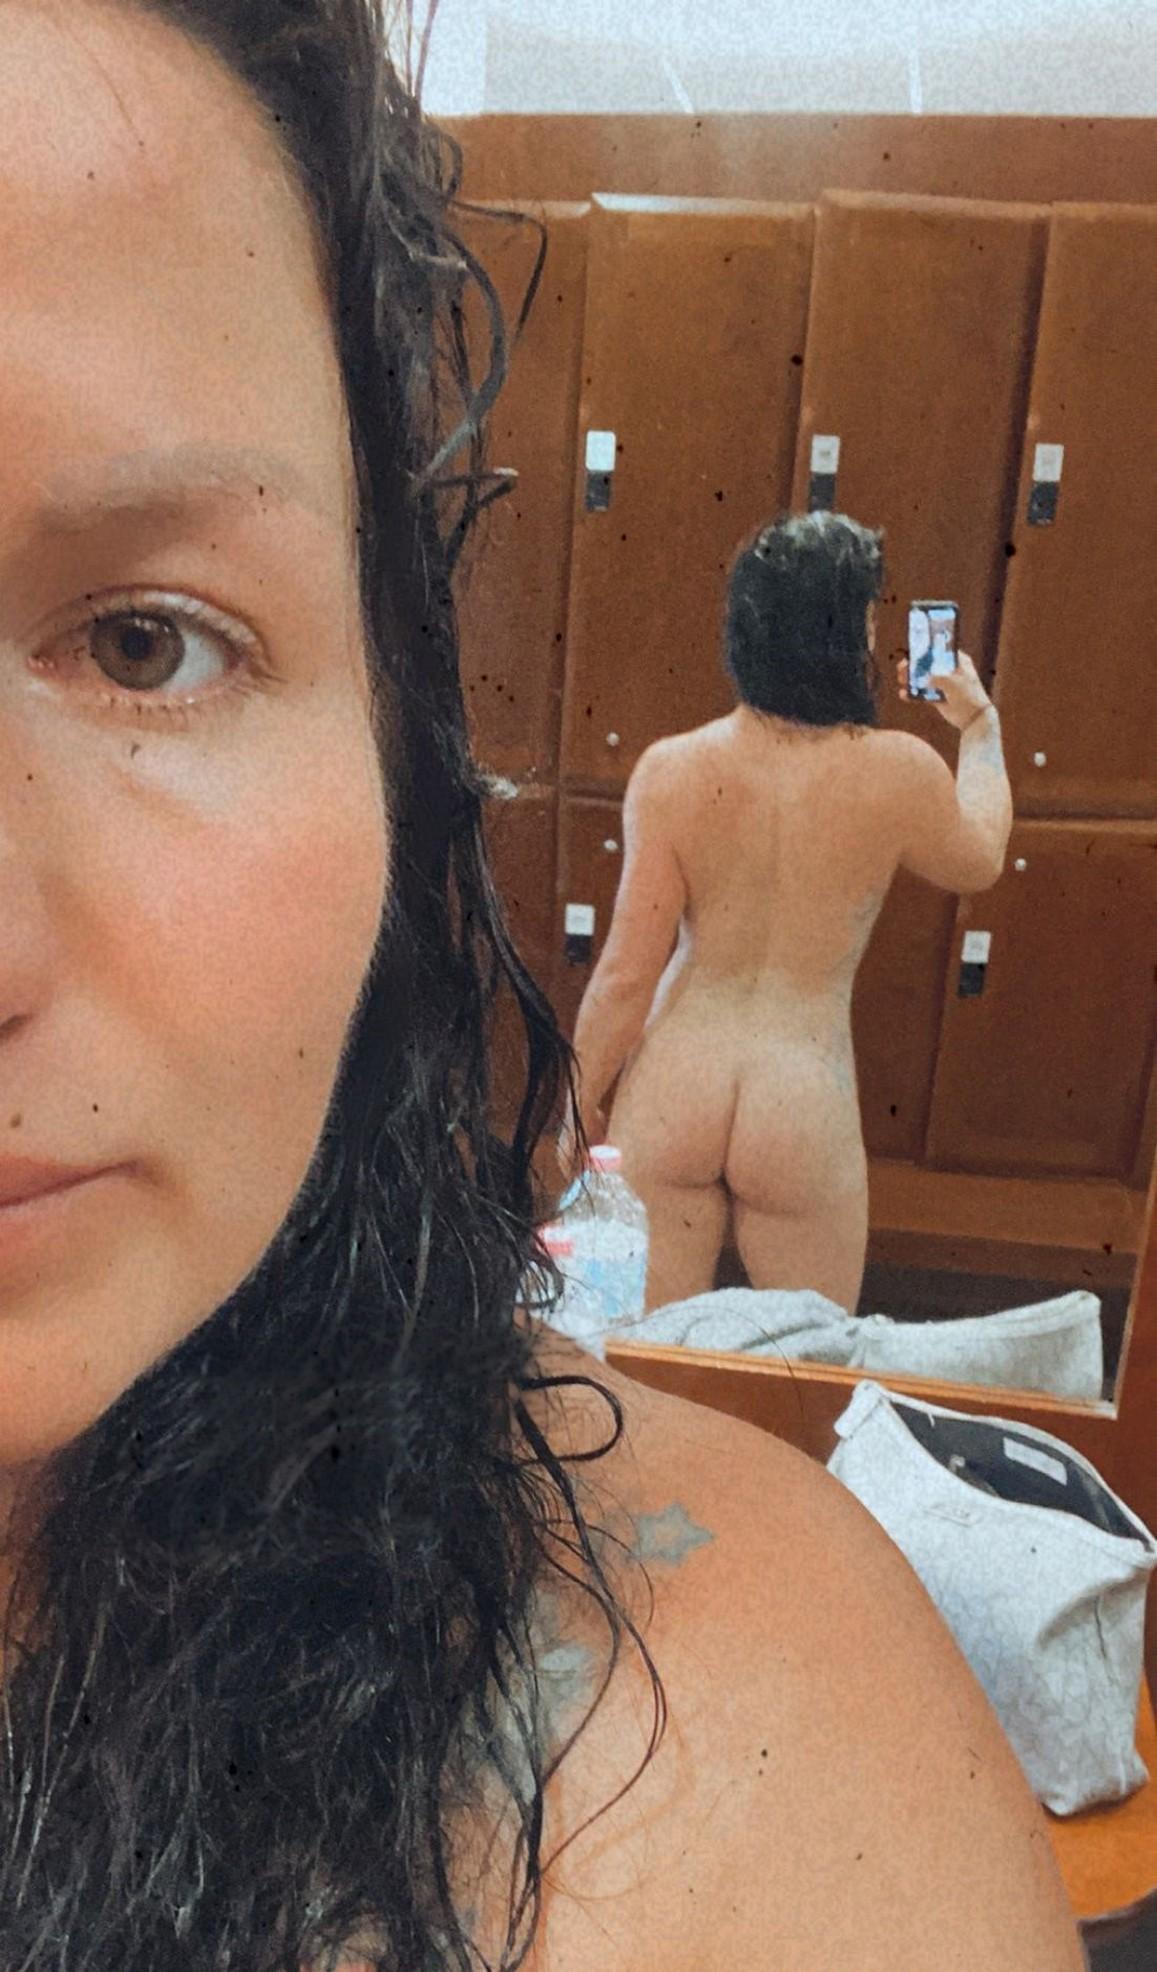 Katharina Lehner nude photos leaked The Fappening 2021